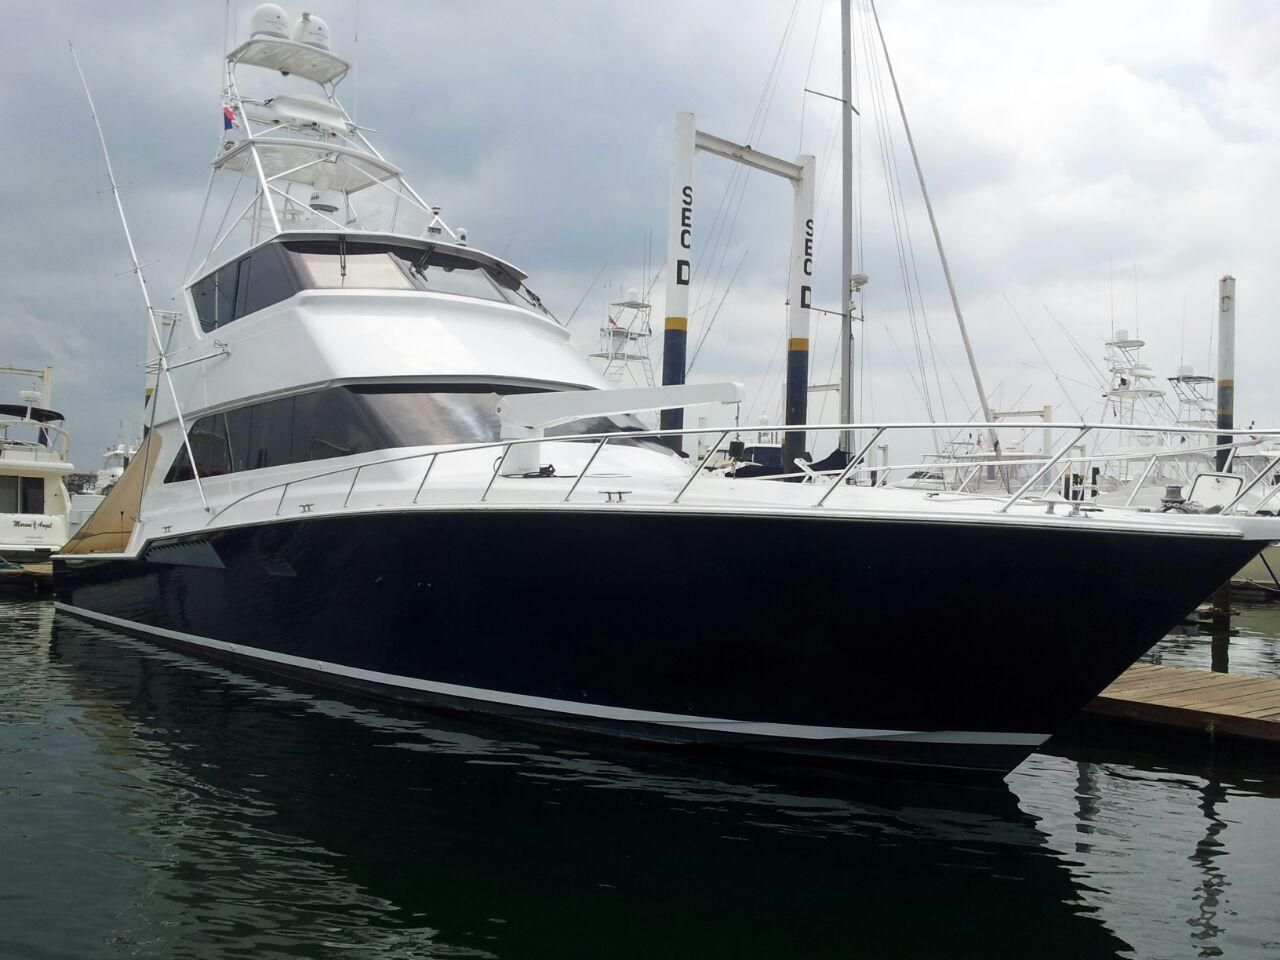 1999 Viking Sport Fisherman Power Boat For Sale Www Yachtworld Com